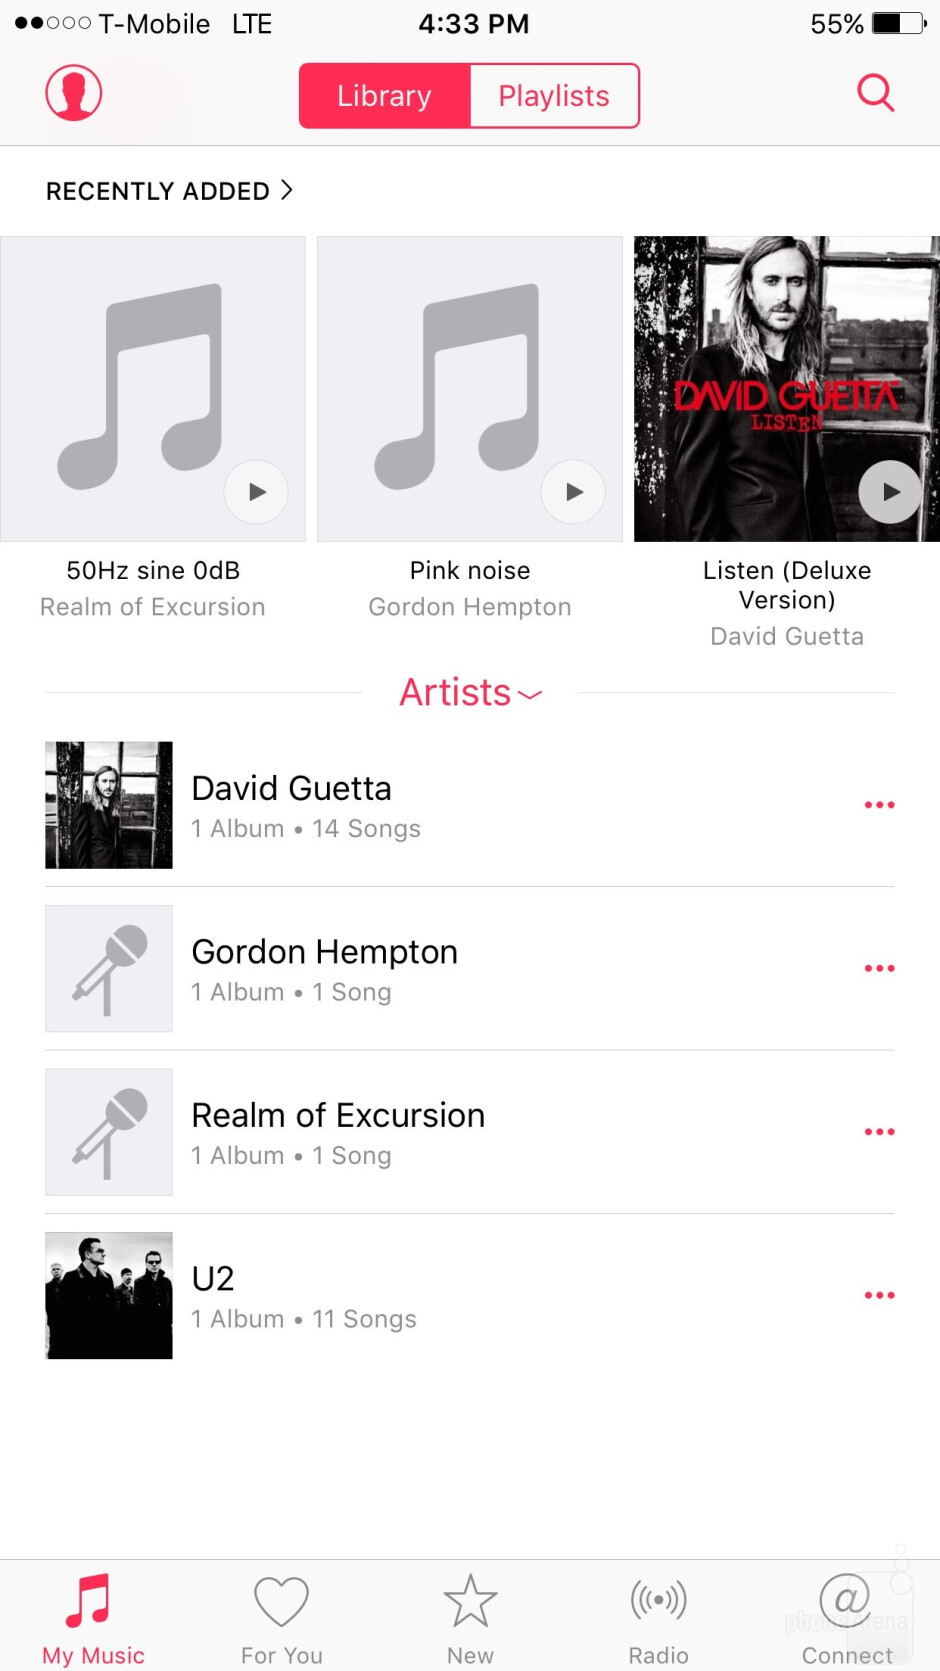 Apple iPhone 6s Plus - Music players - LG G5 vs Apple iPhone 6s Plus